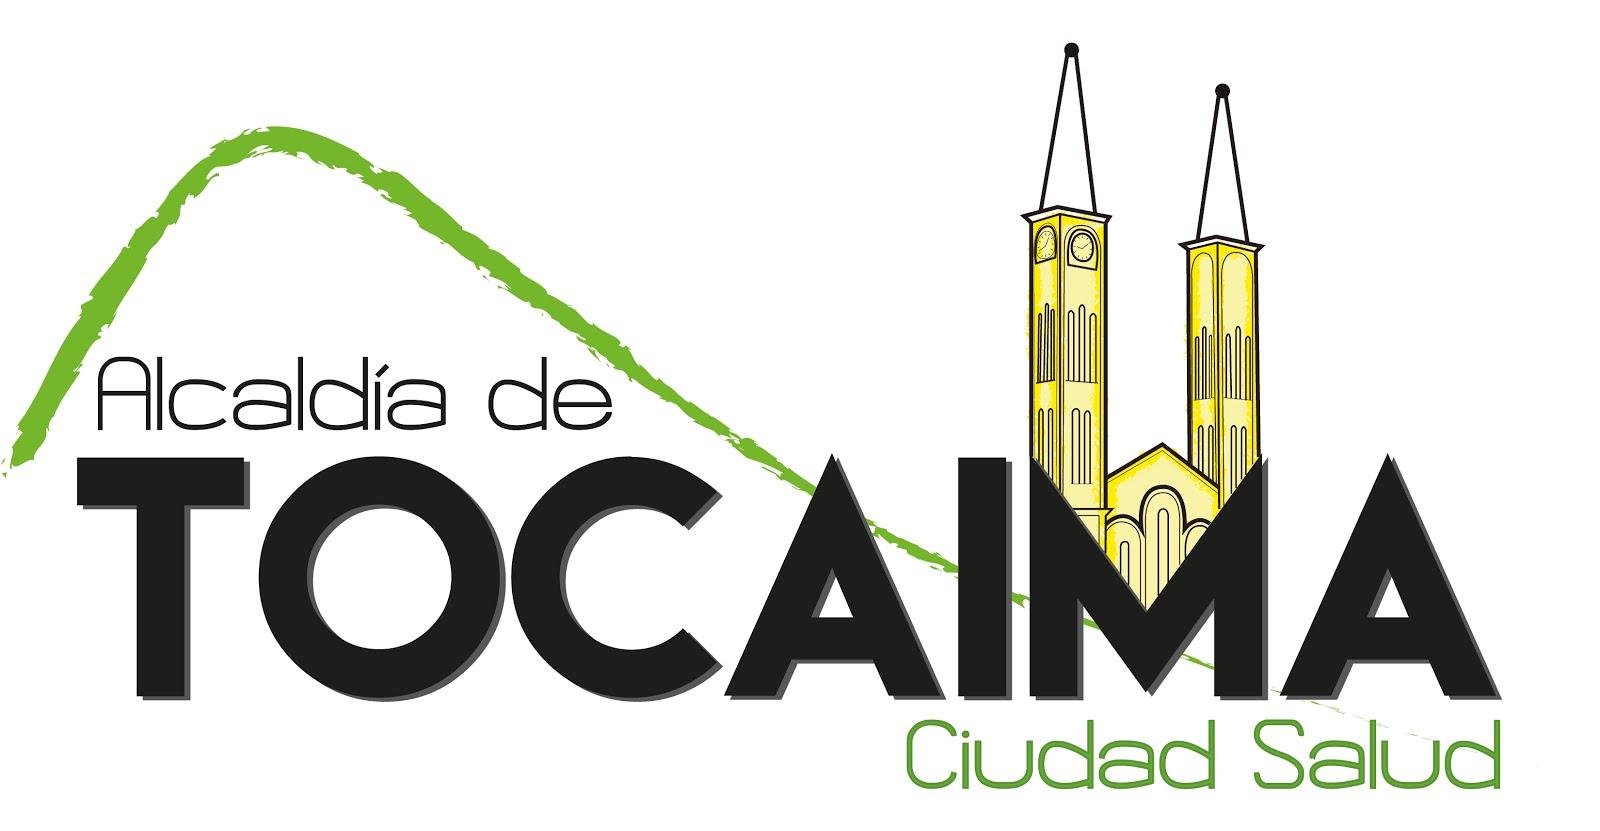 ALCALDIA DE TOCAIMA